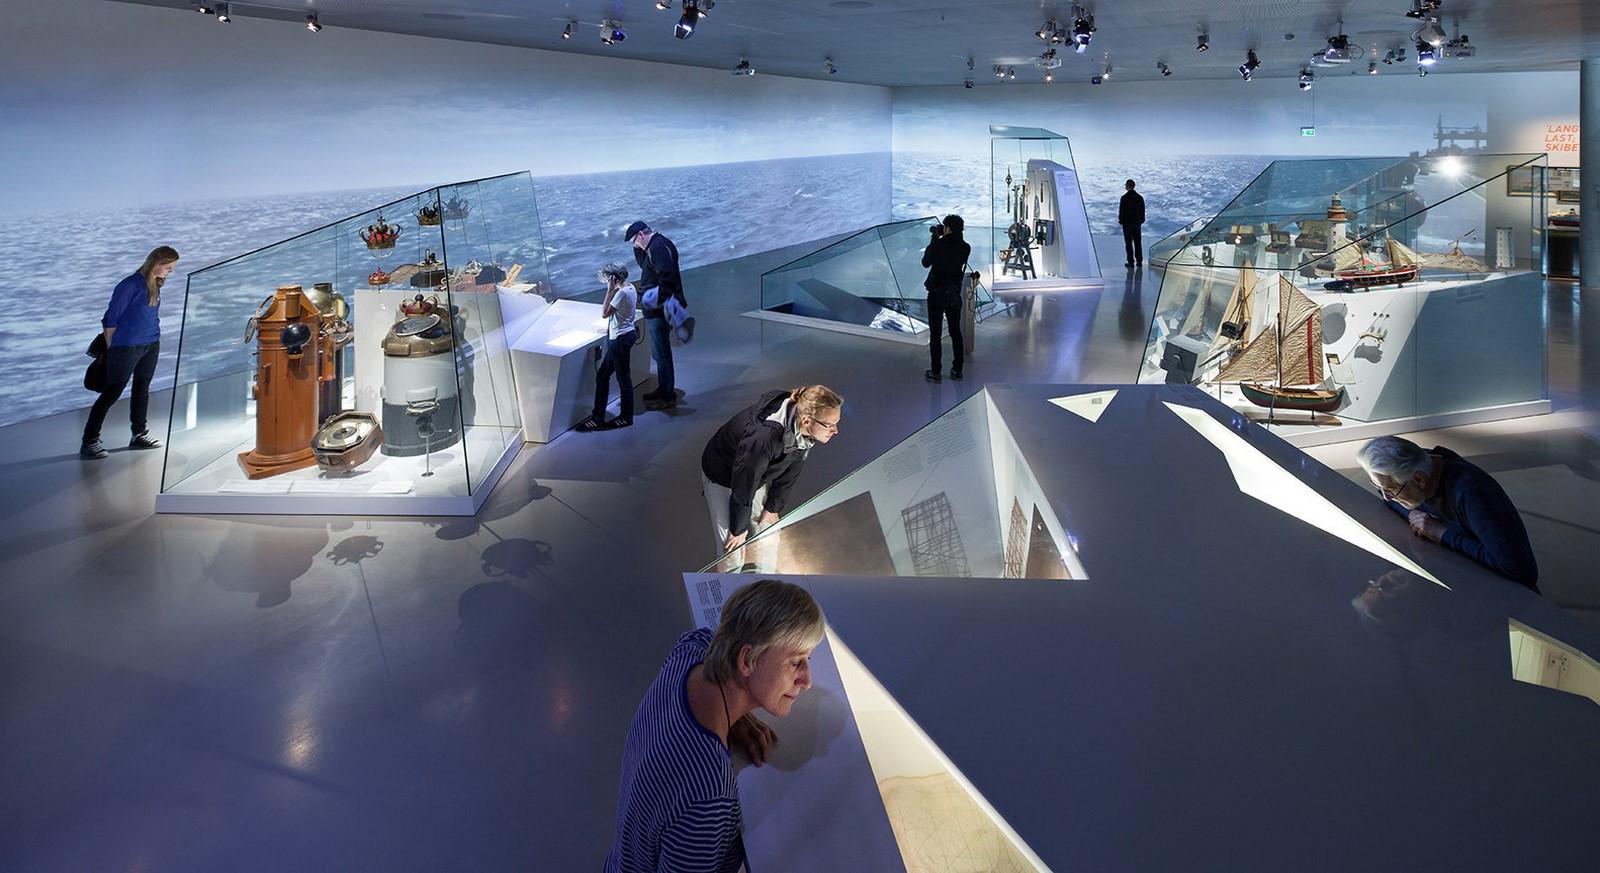 Danish National Maritime Museum by BIG: Dock within the Dock - Sheet8